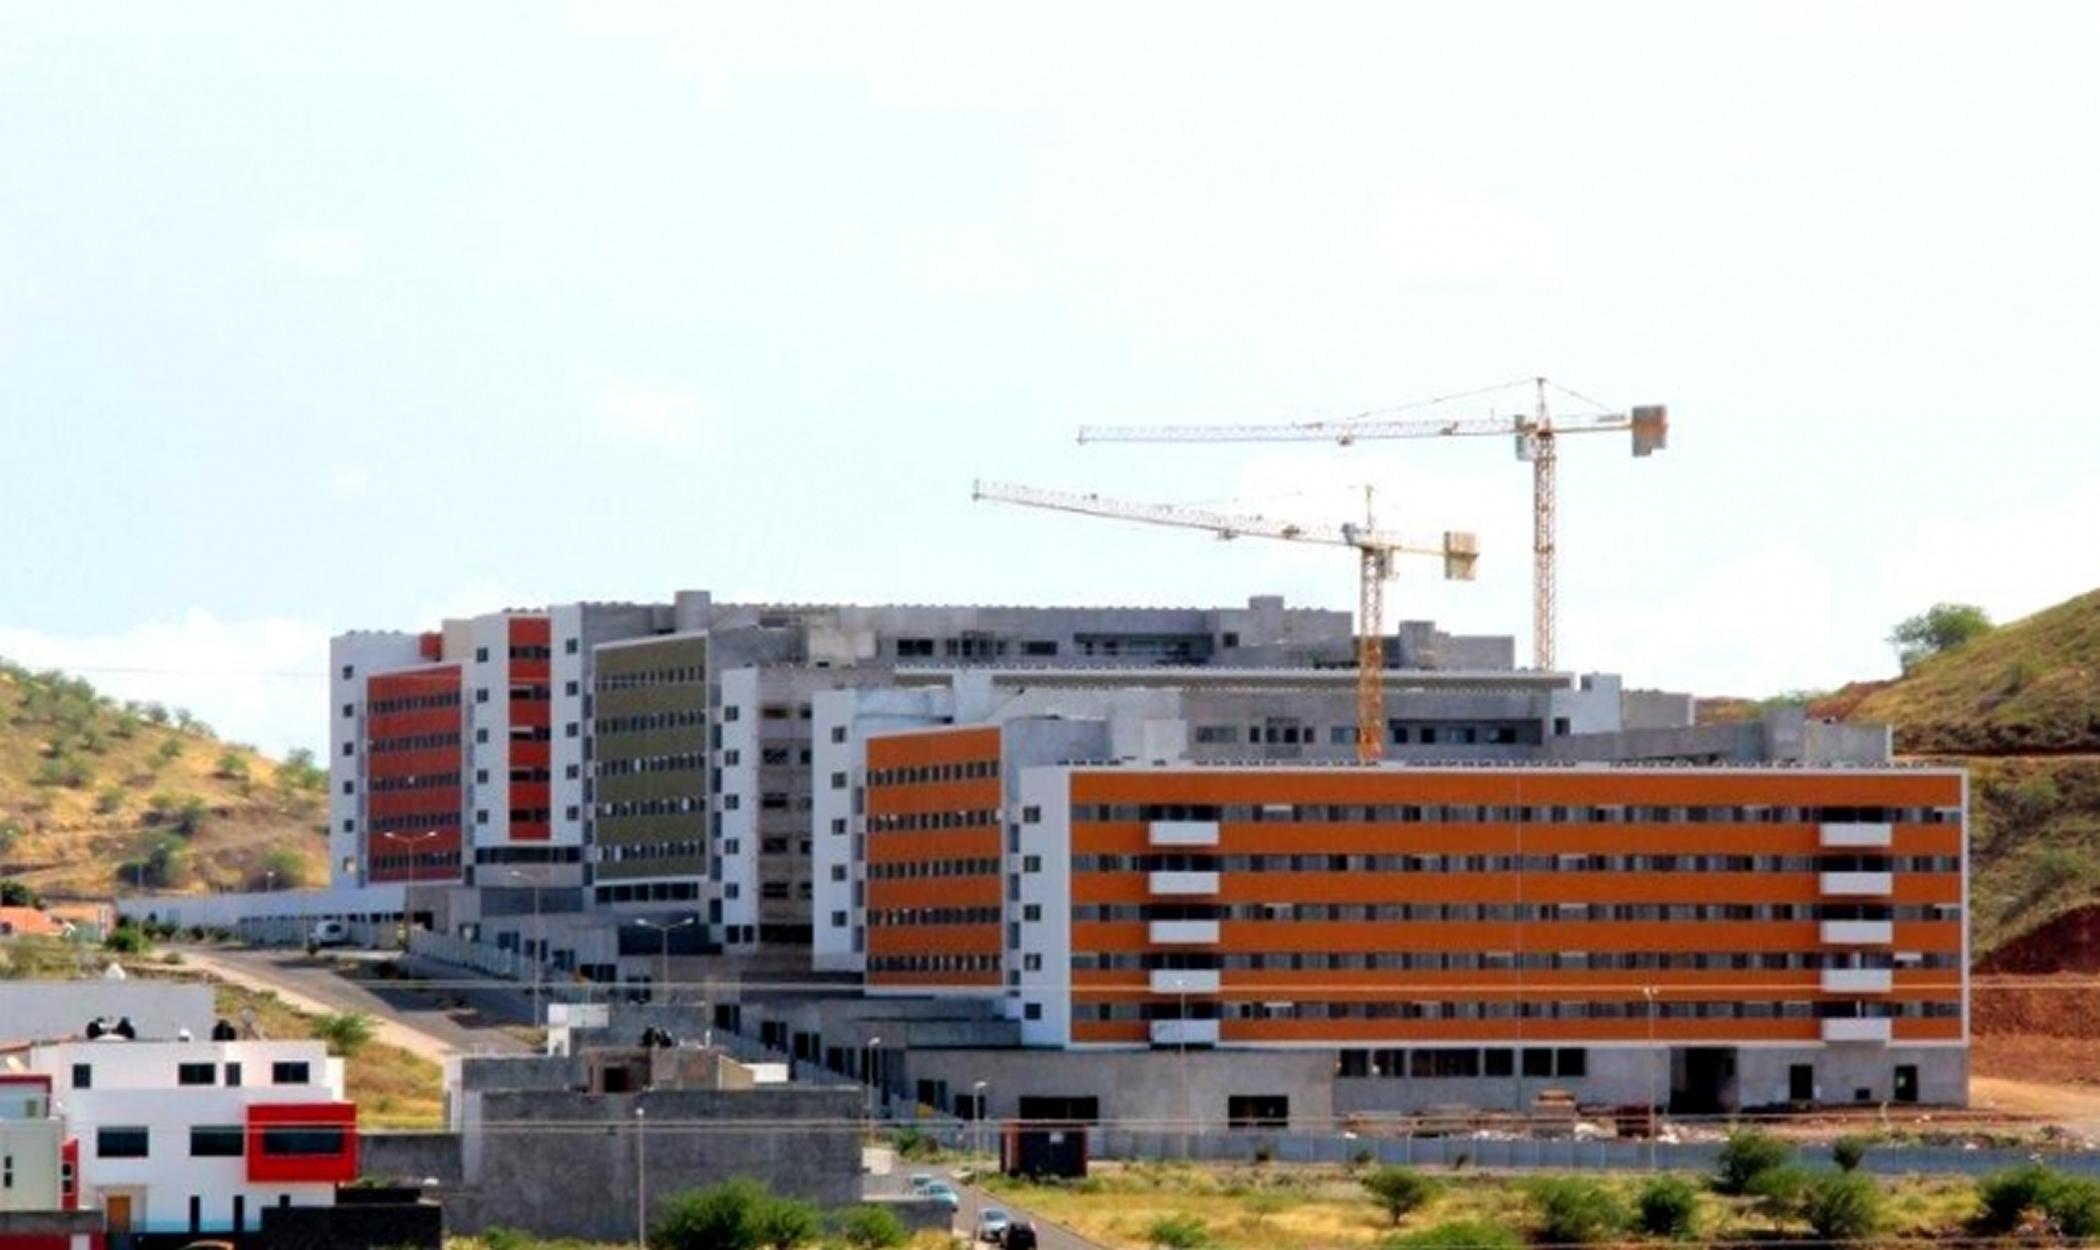 Complexo de 390 habitações de interesse social